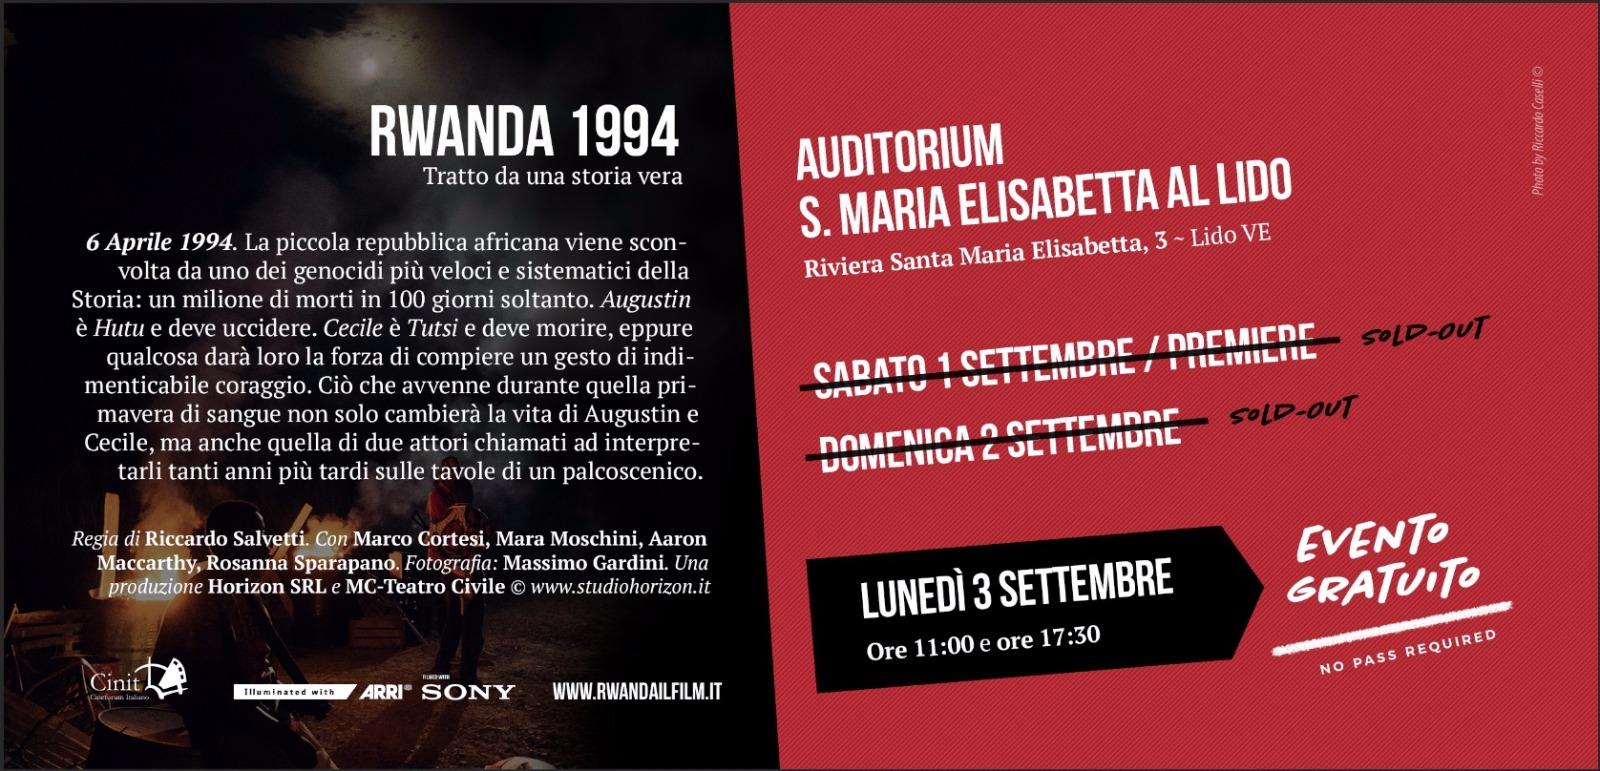 Proiezione del film Rwanda all'Auditorium Santa Maria Elisabetta al Lido di Venezia